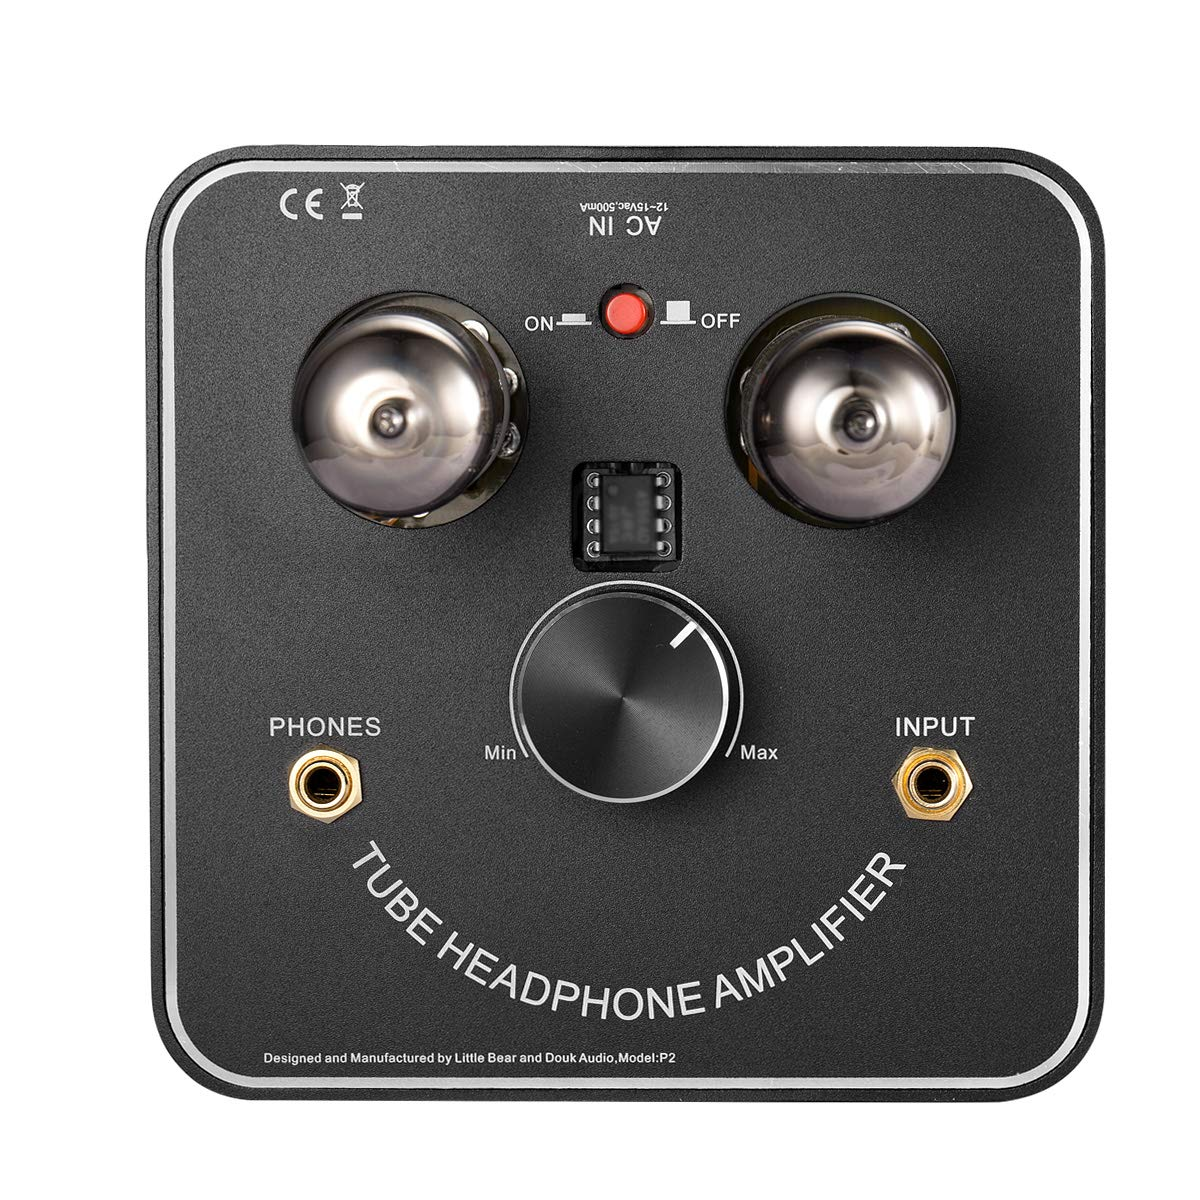 nobsound Little Bear P2/Mini 6/C11/Vacuum Tube Headphone Amplifier est/éreo Hi-Fi Audio Amp; Replaceable Tube and Op Amp; with LED VU Meter Music Audio Spectrum Amplificador